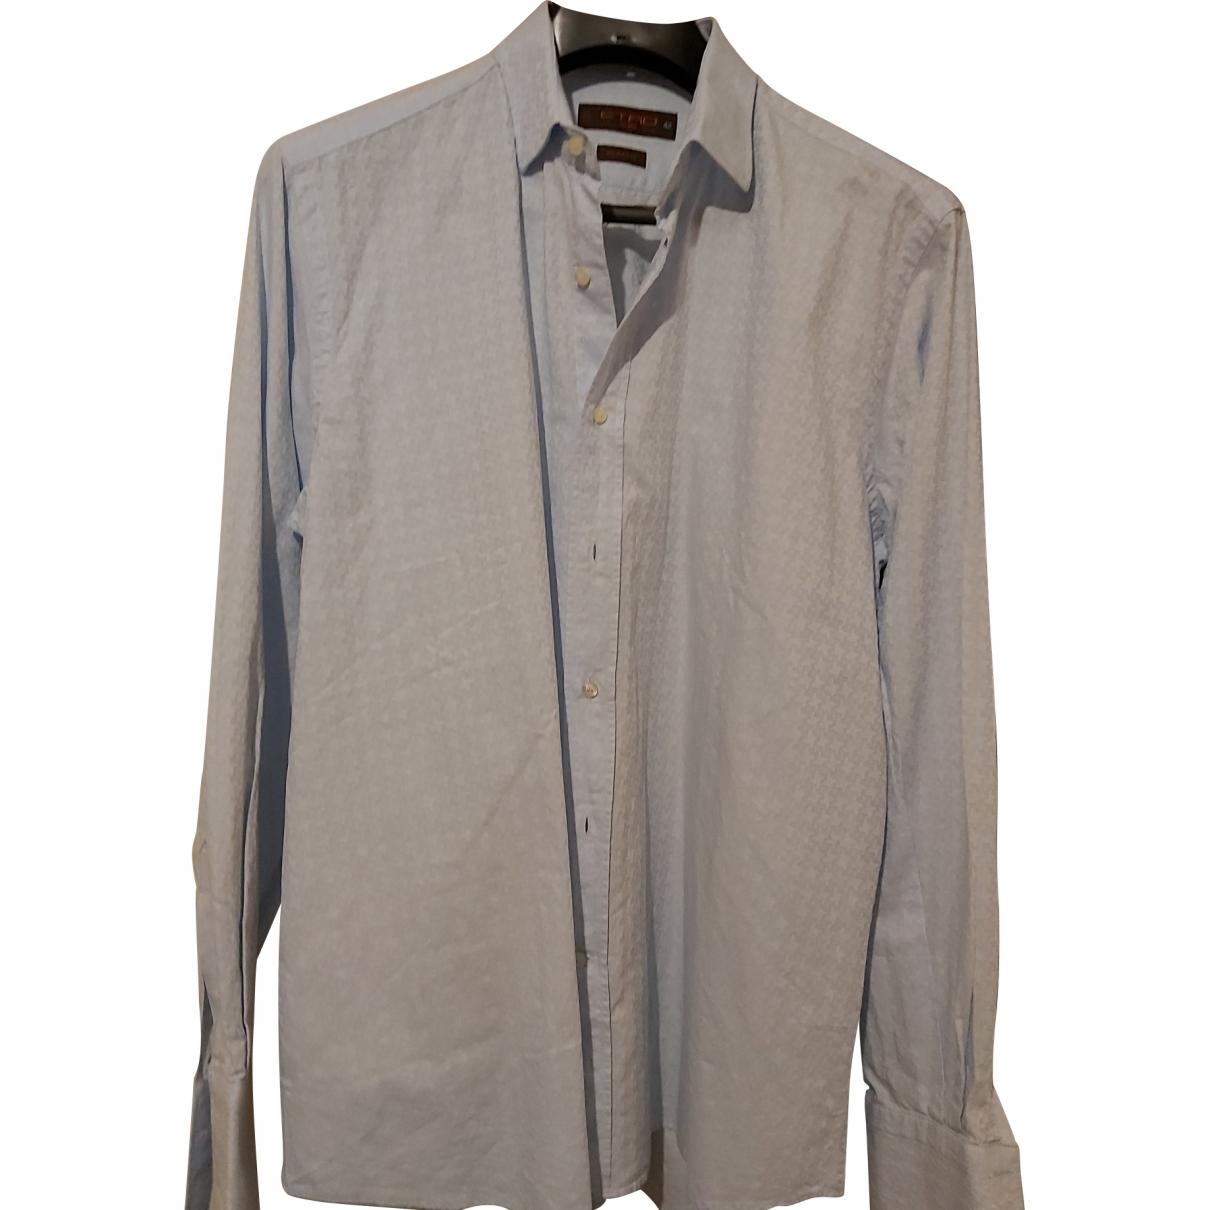 Etro \N Blue Cotton Shirts for Men 42 EU (tour de cou / collar)